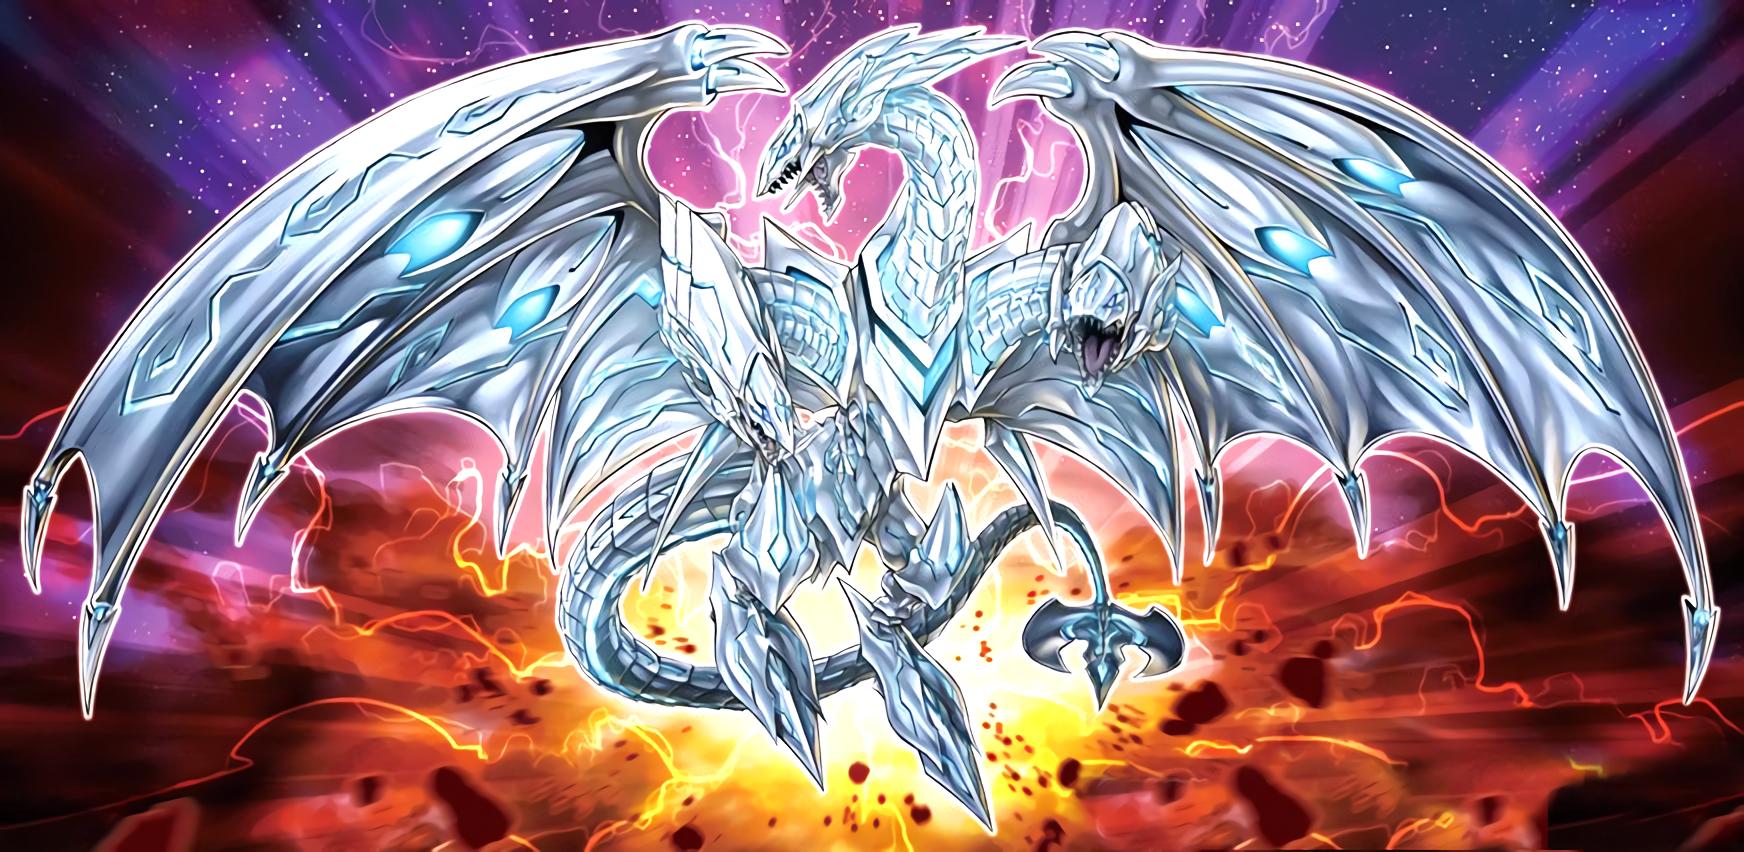 Neo Blue Eyes Ultimate Dragon Full Artwork By Alanmac95 On Deviantart In 2020 Dragon Artwork Ultimate Dragon White Dragon